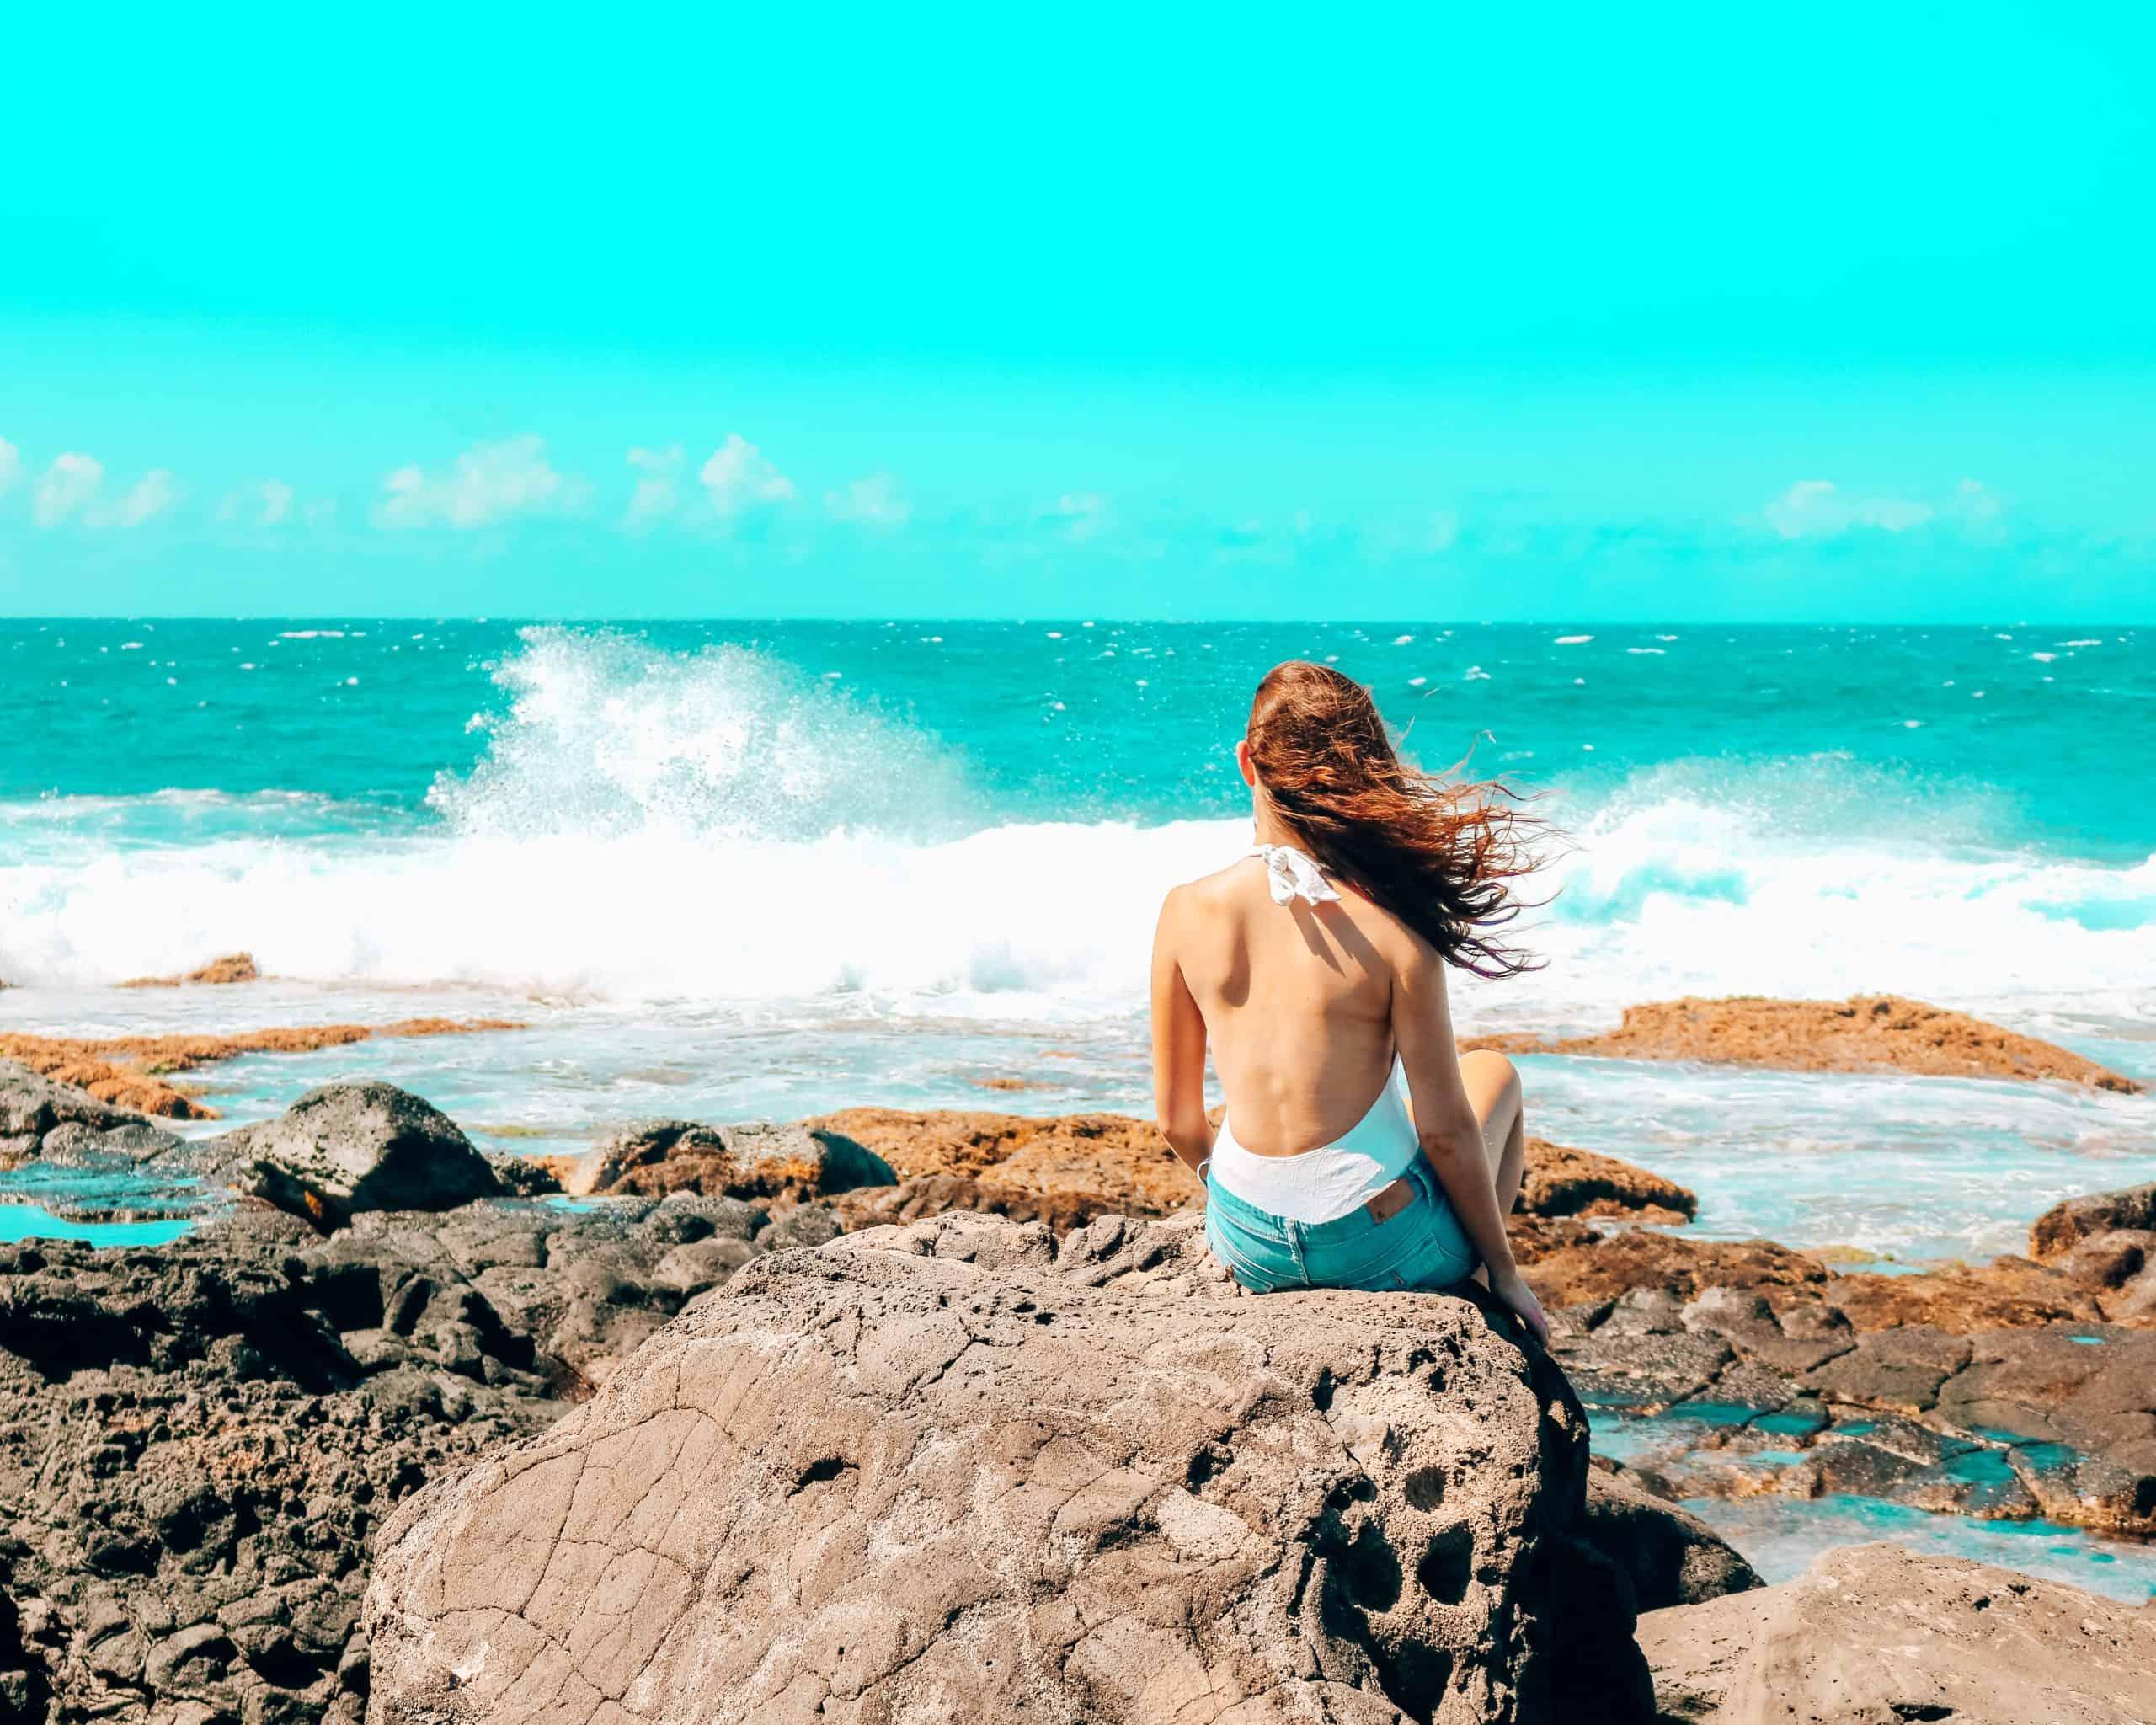 Bettina looking at a crashing wave in Hawaii